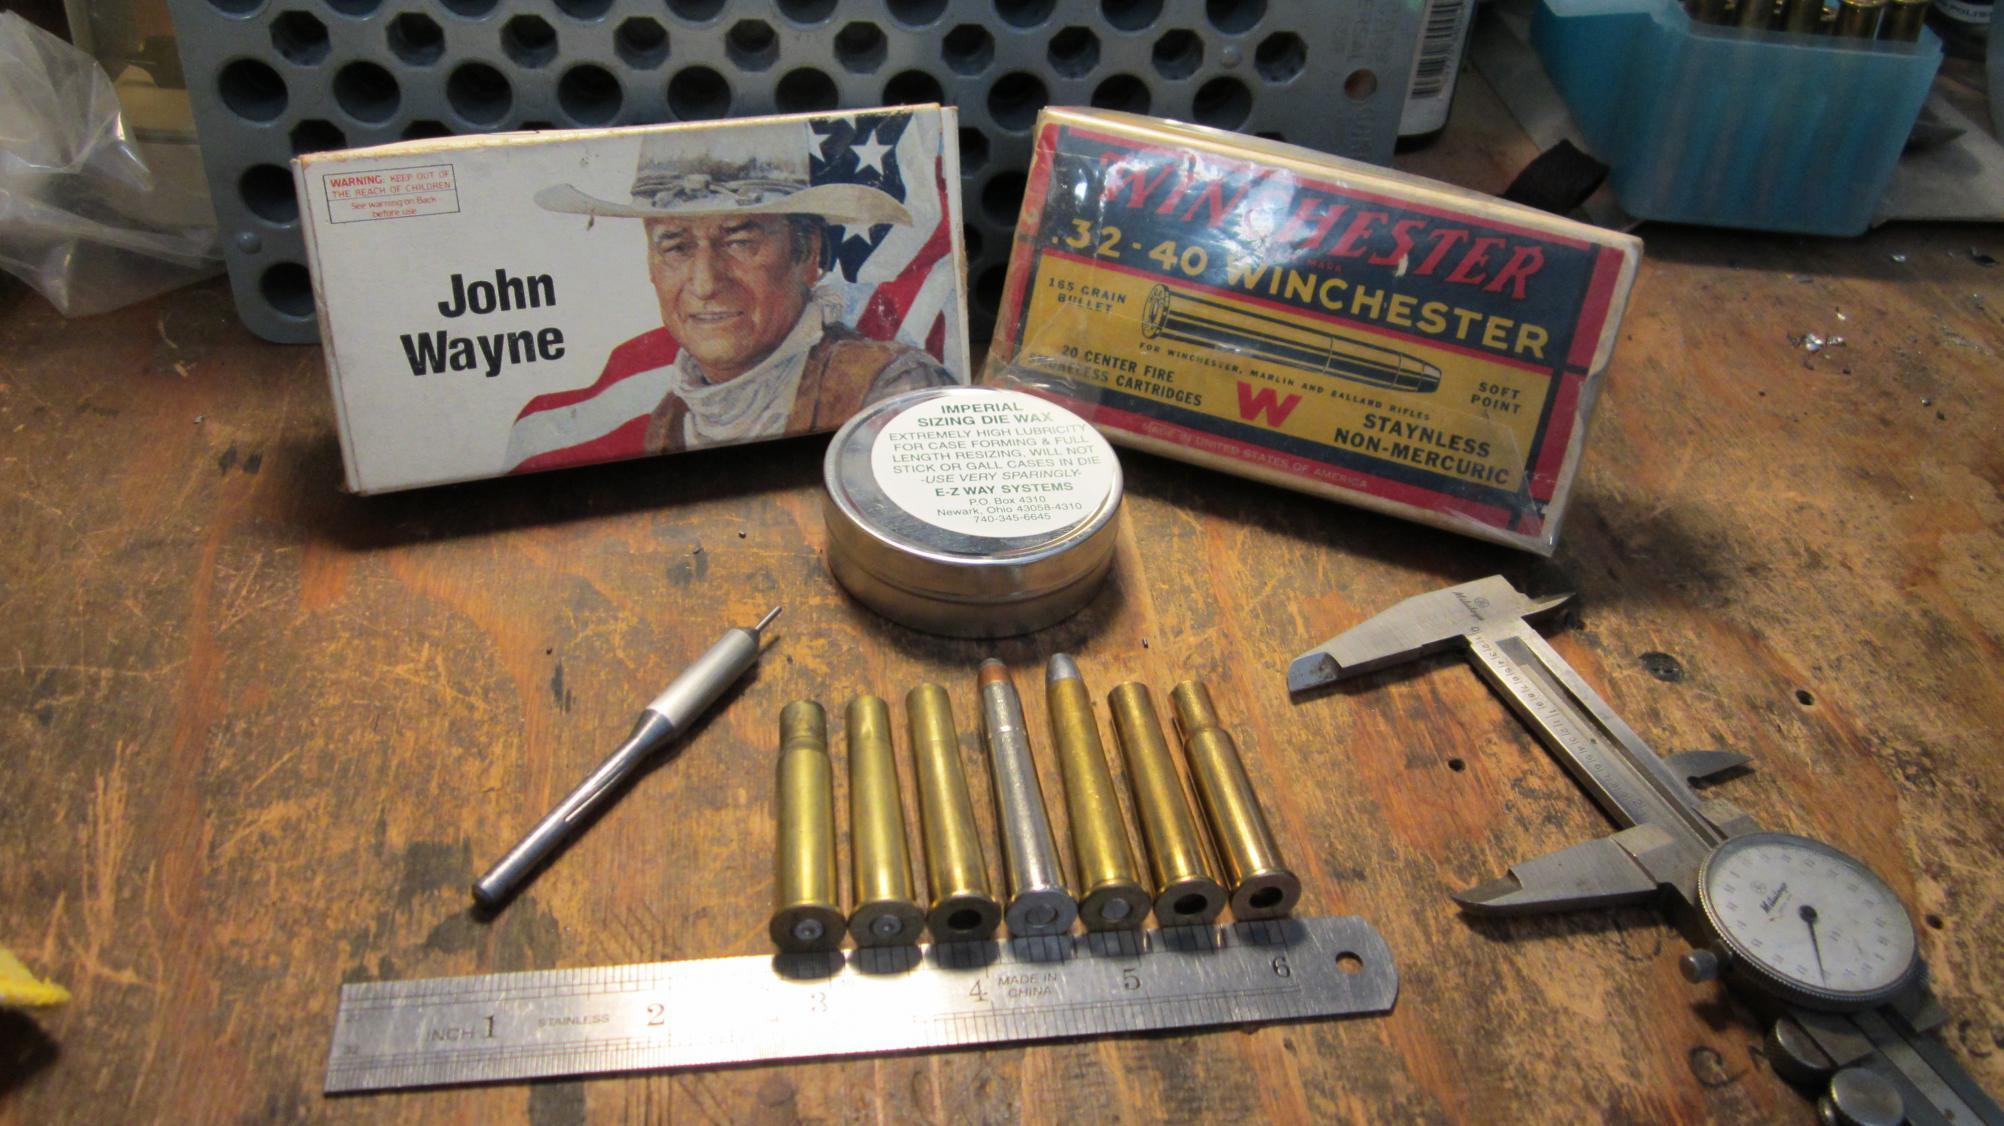 32-40 John Wayne edition-img_3774.jpg